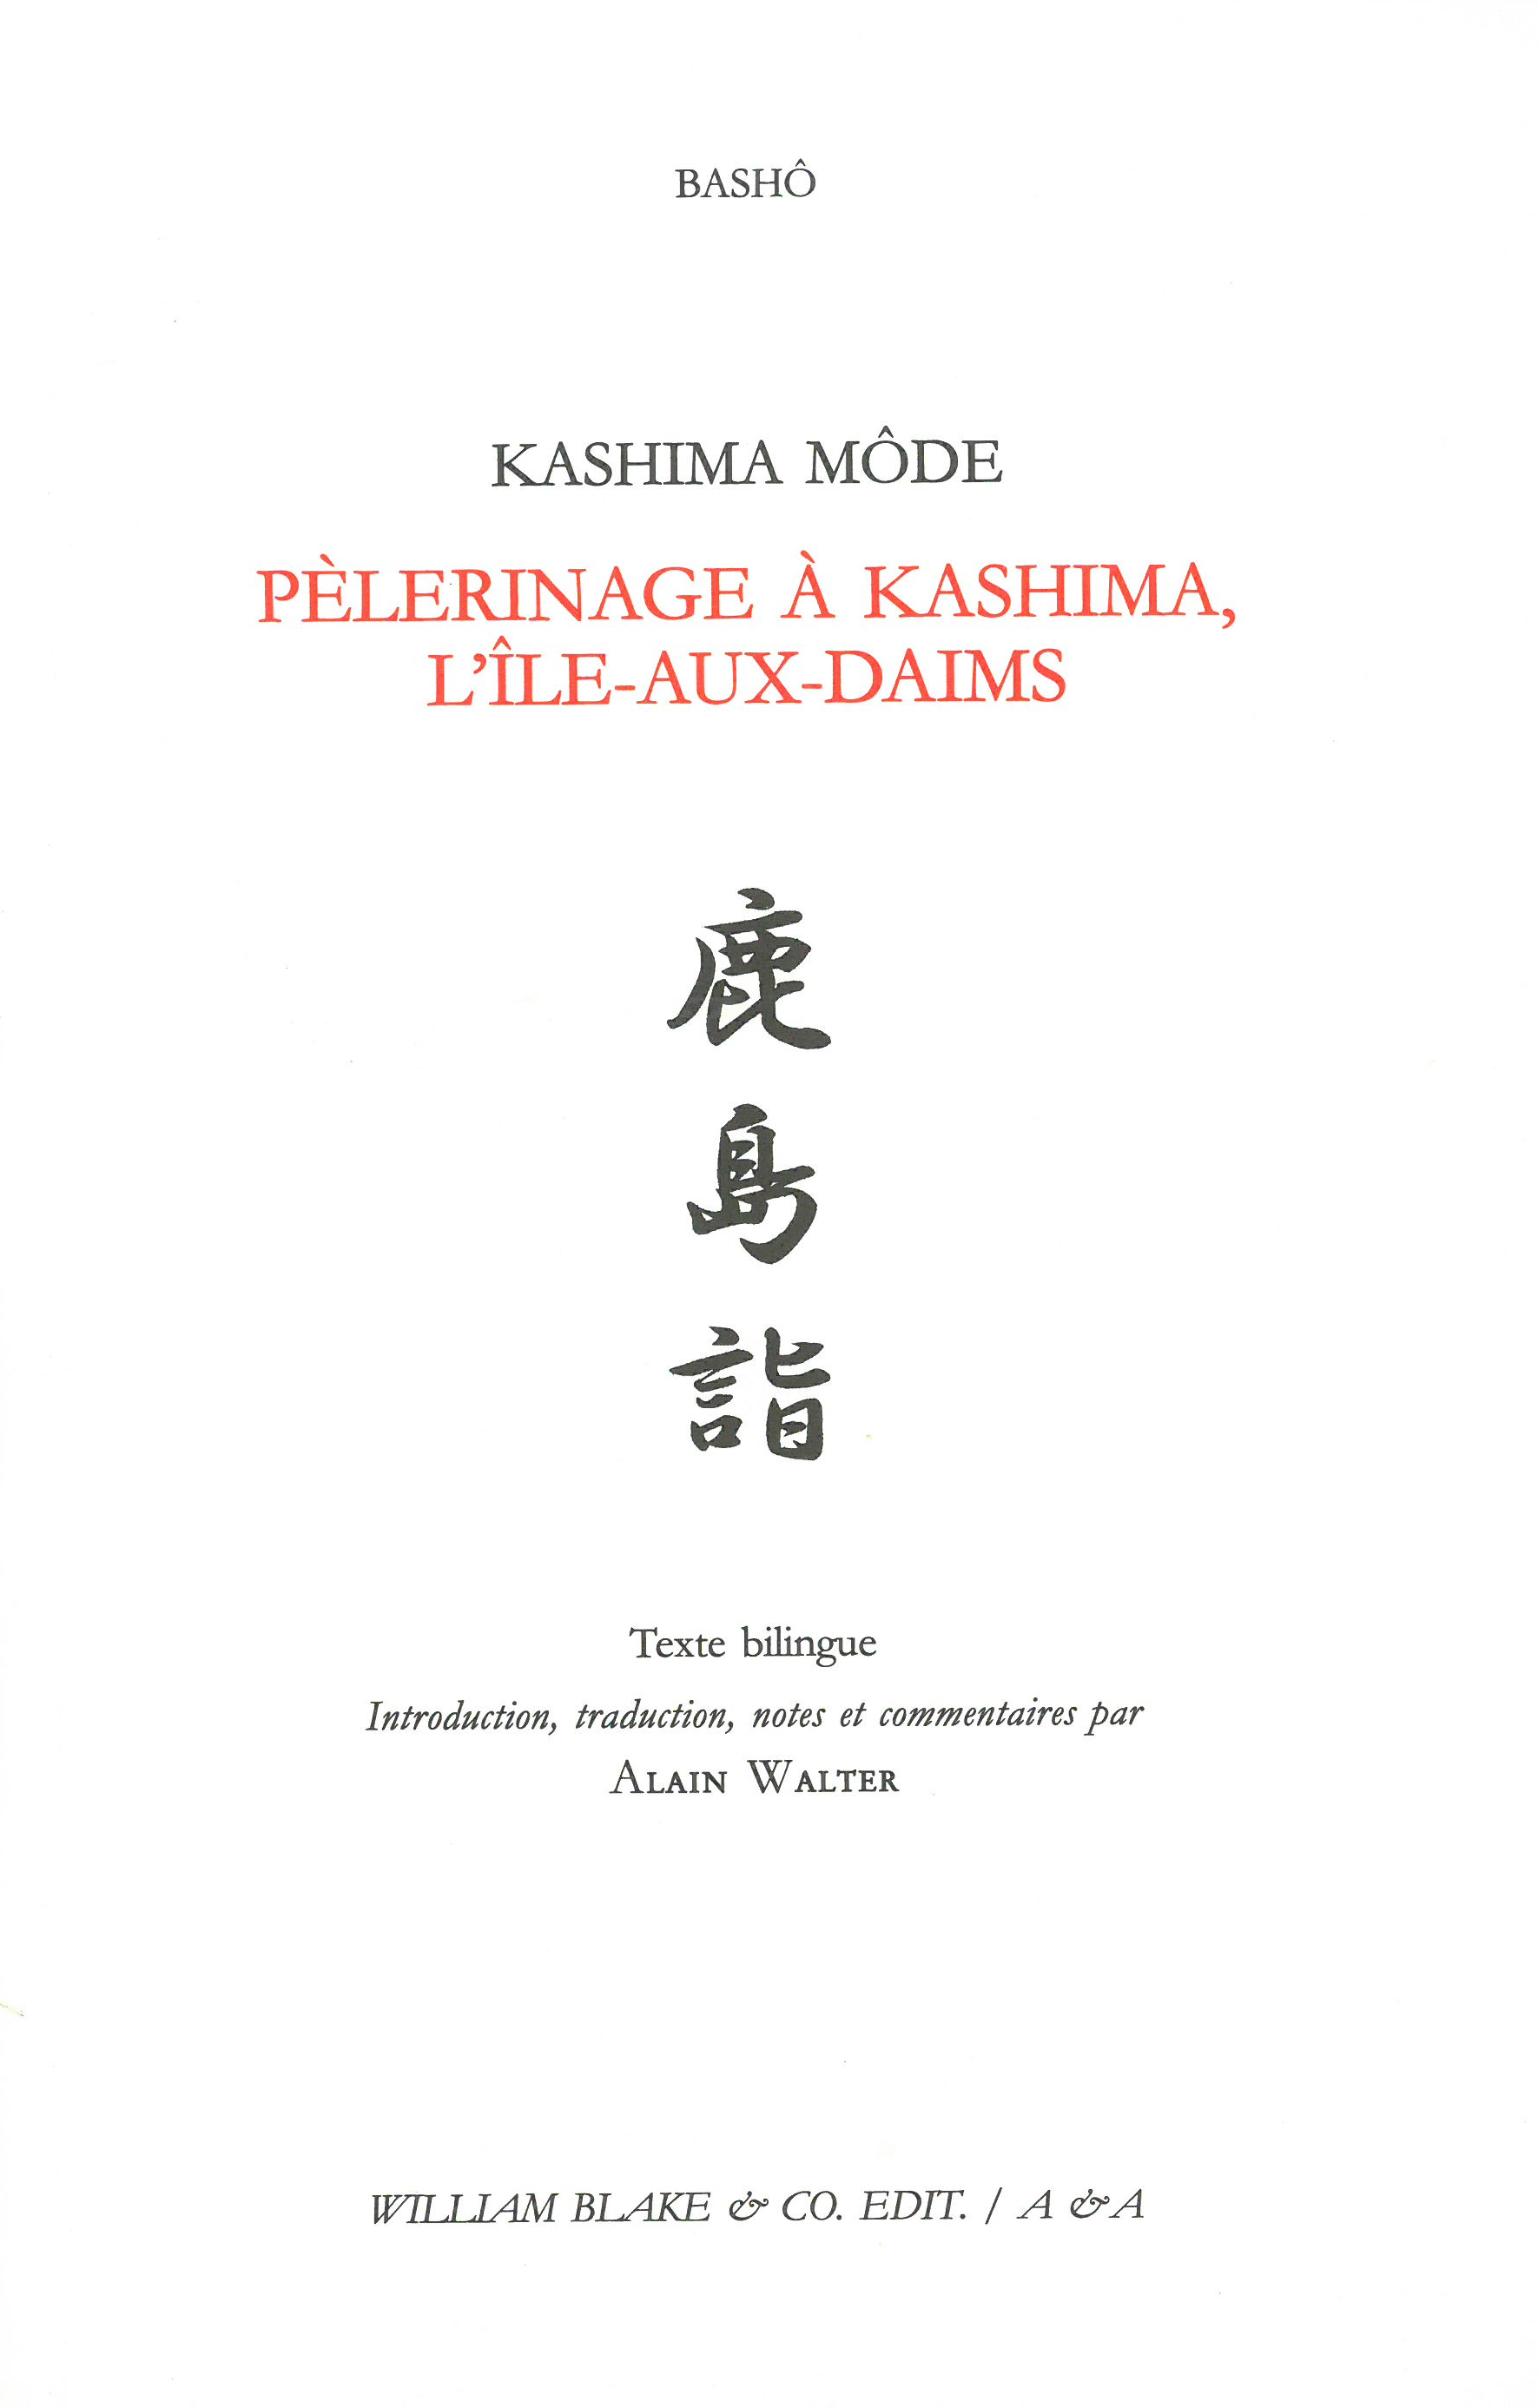 PELERINAGE A KASHIMA, L'ILE-AUX-DAIMS